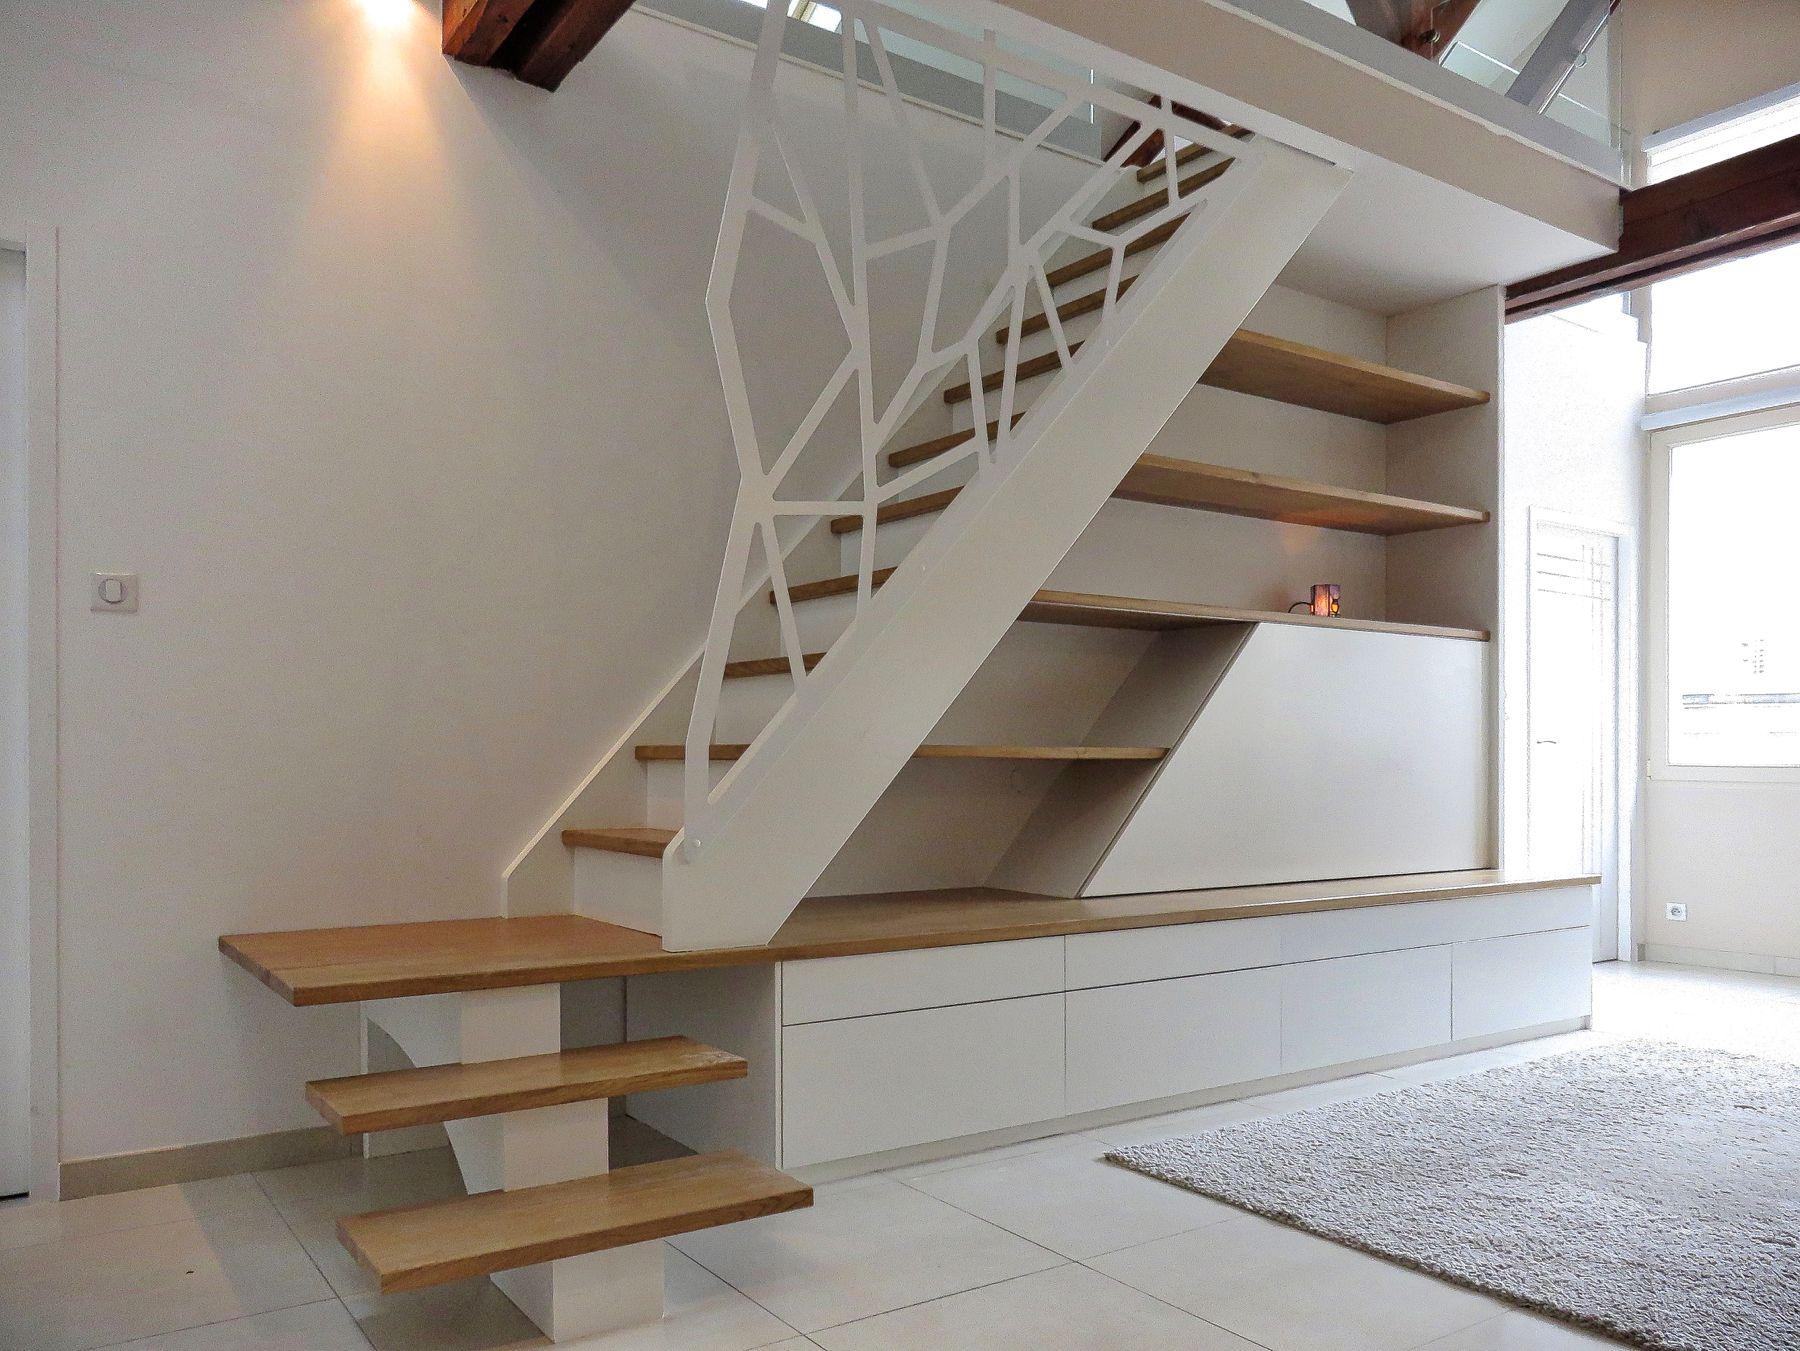 GERRIET - Galerie Escaliers Deco   Amenagement escalier, Meuble sous escalier, Sous escalier